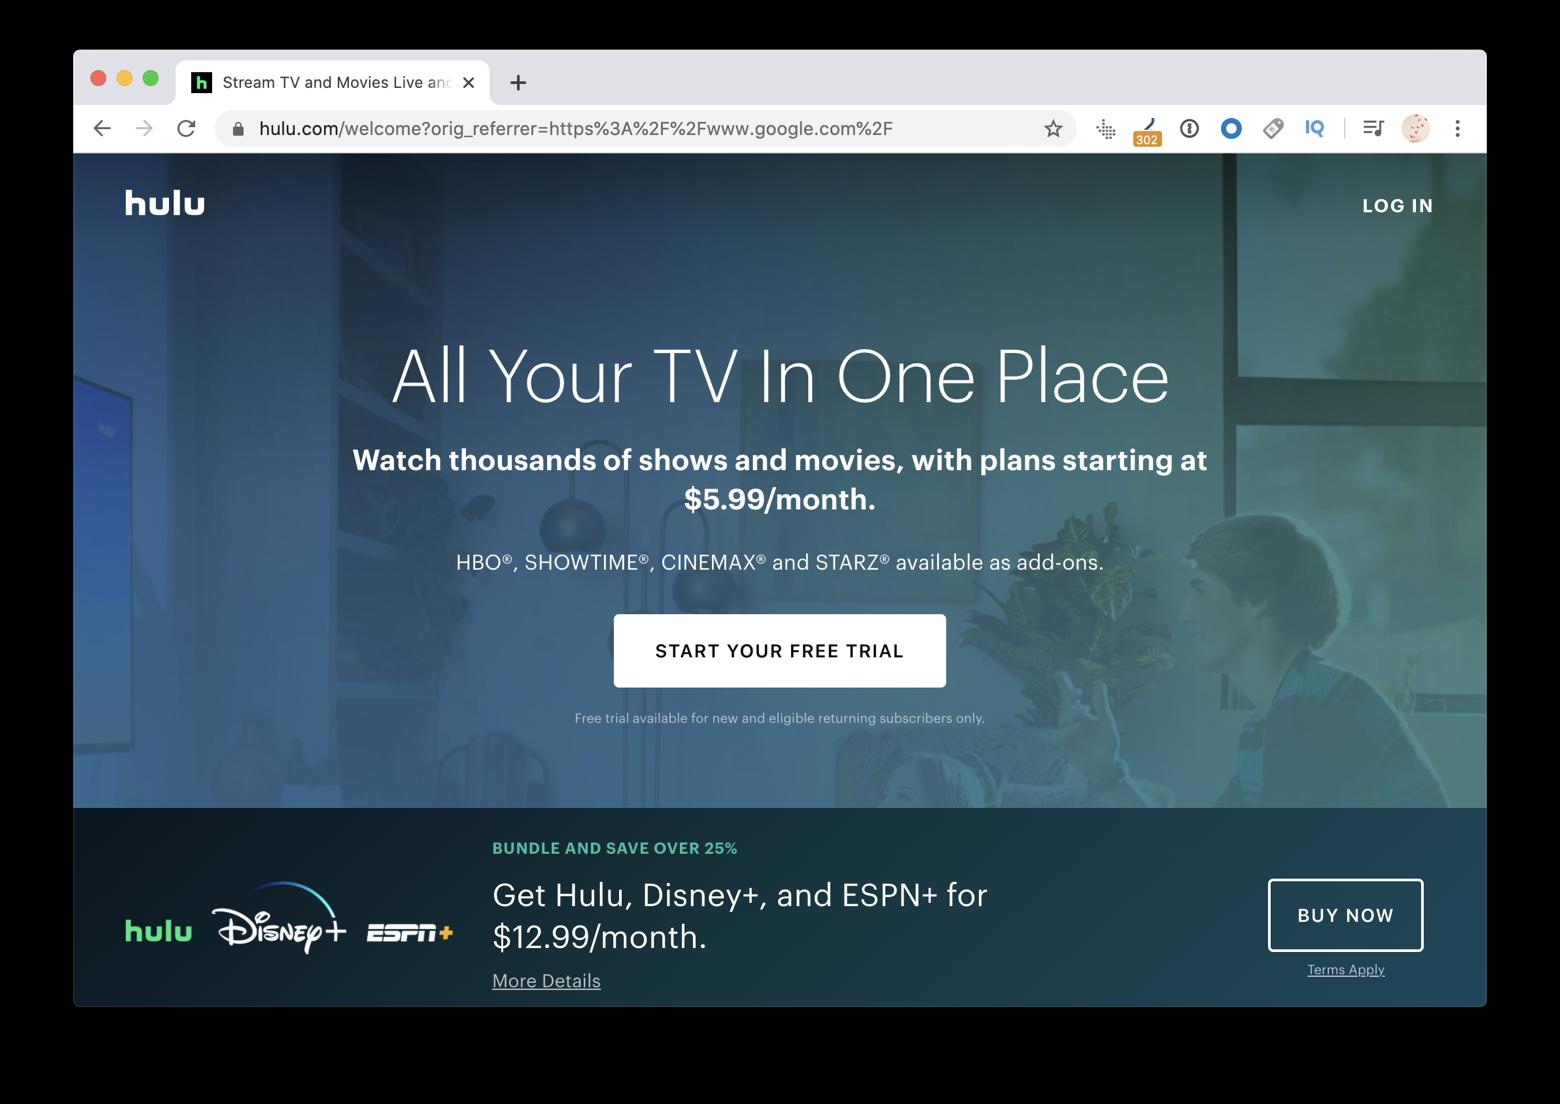 Hulu.com website